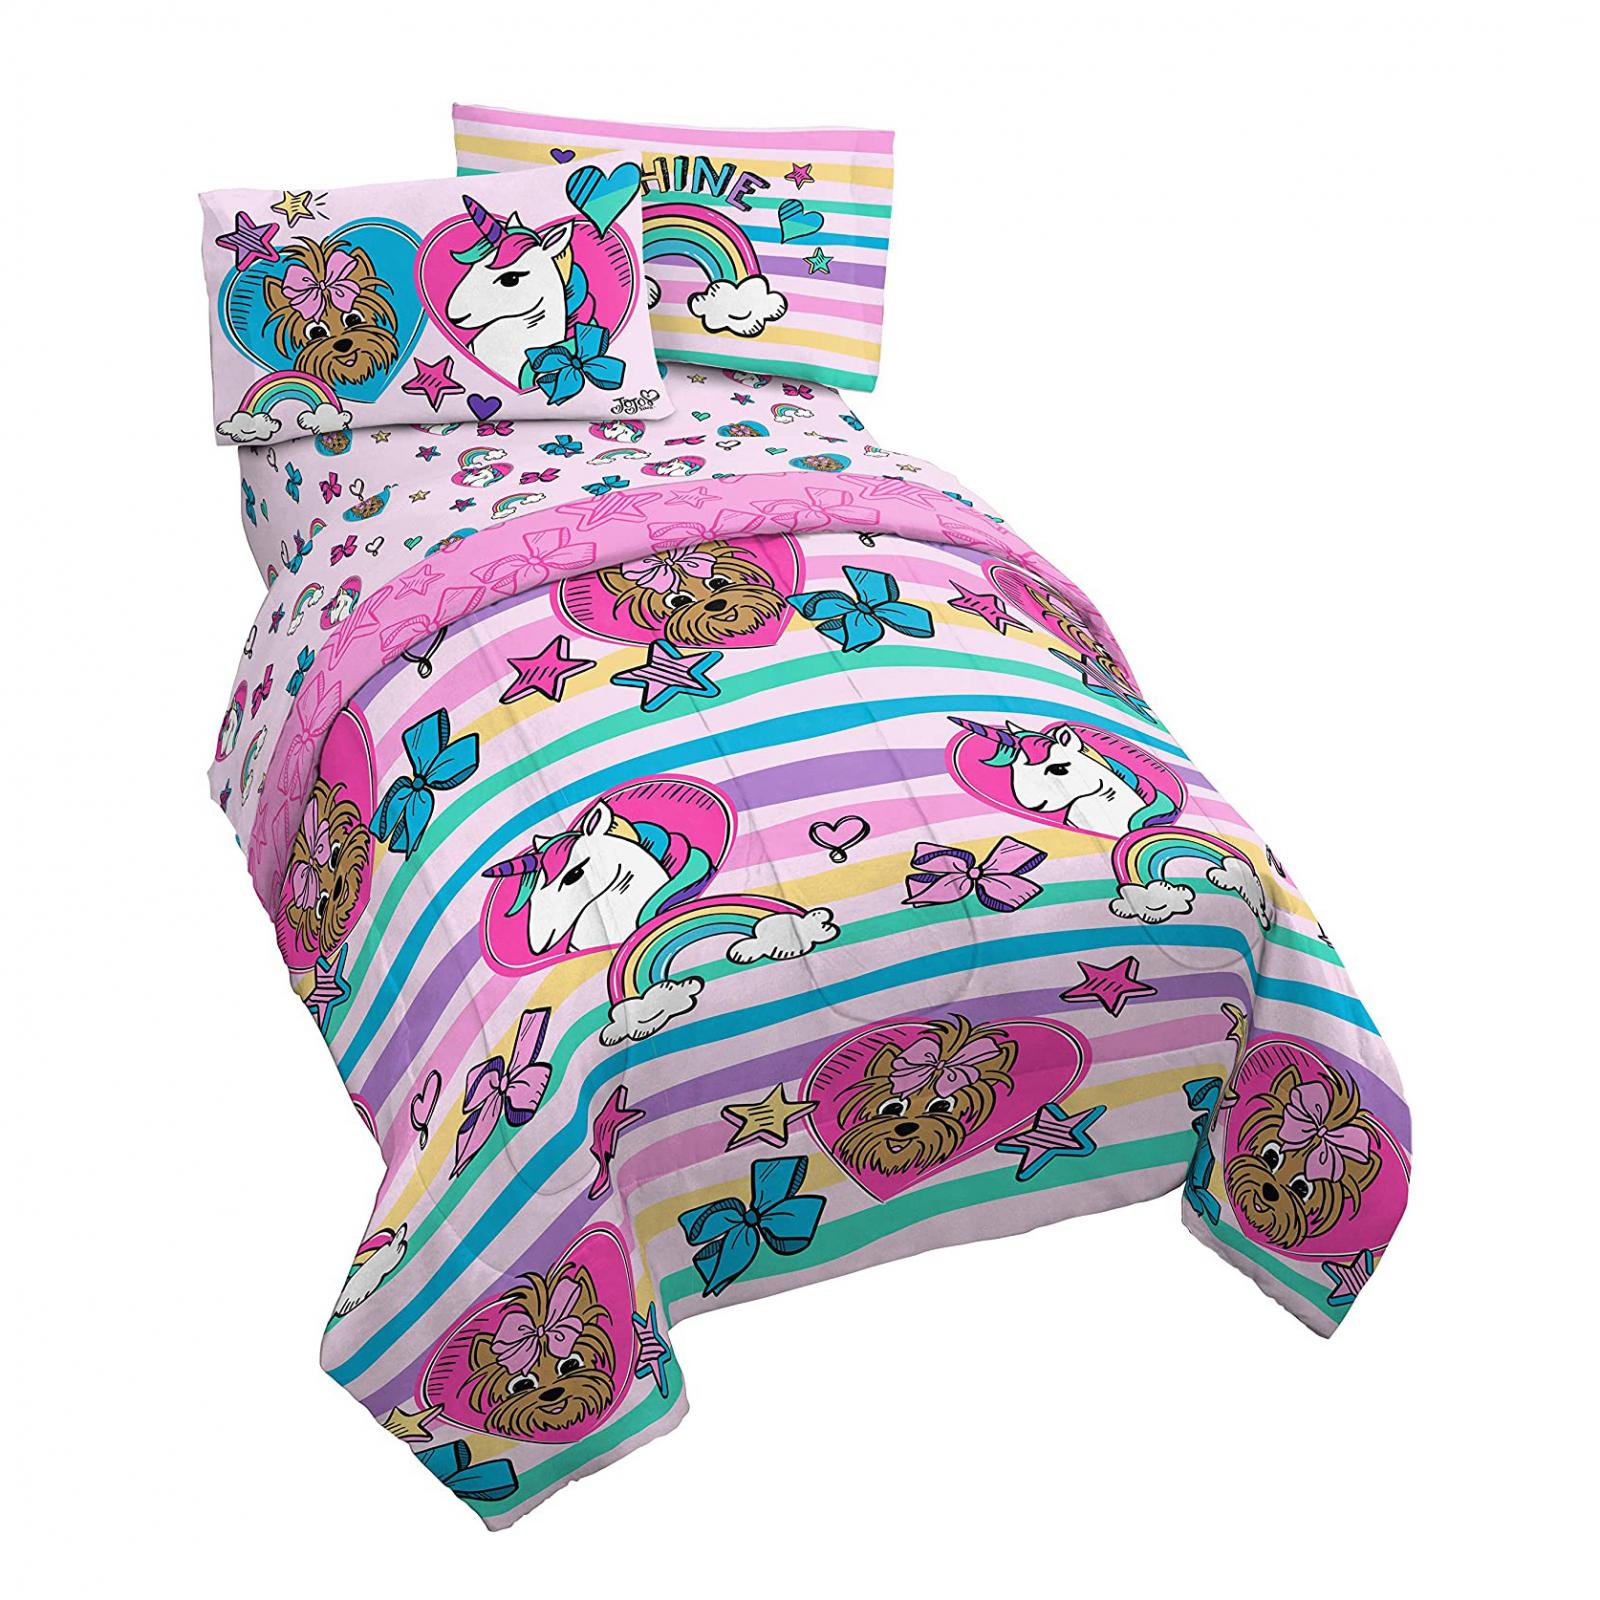 Nickelodeon JoJo Siwa Twin Comforter Reversible Design